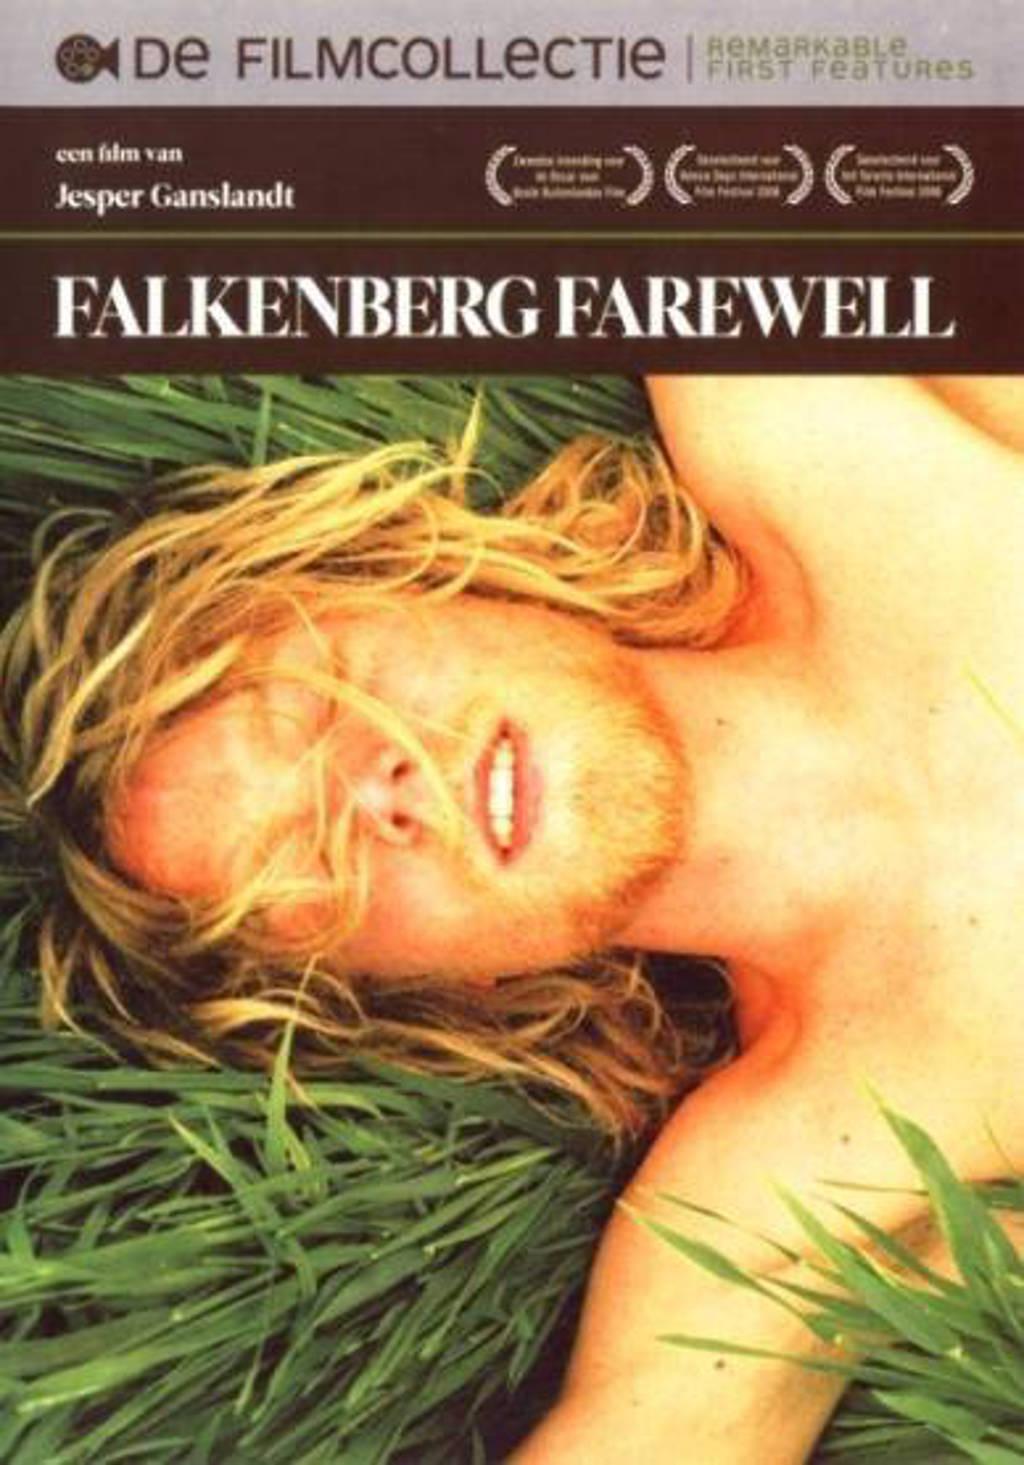 Falkenberg farewell (DVD)